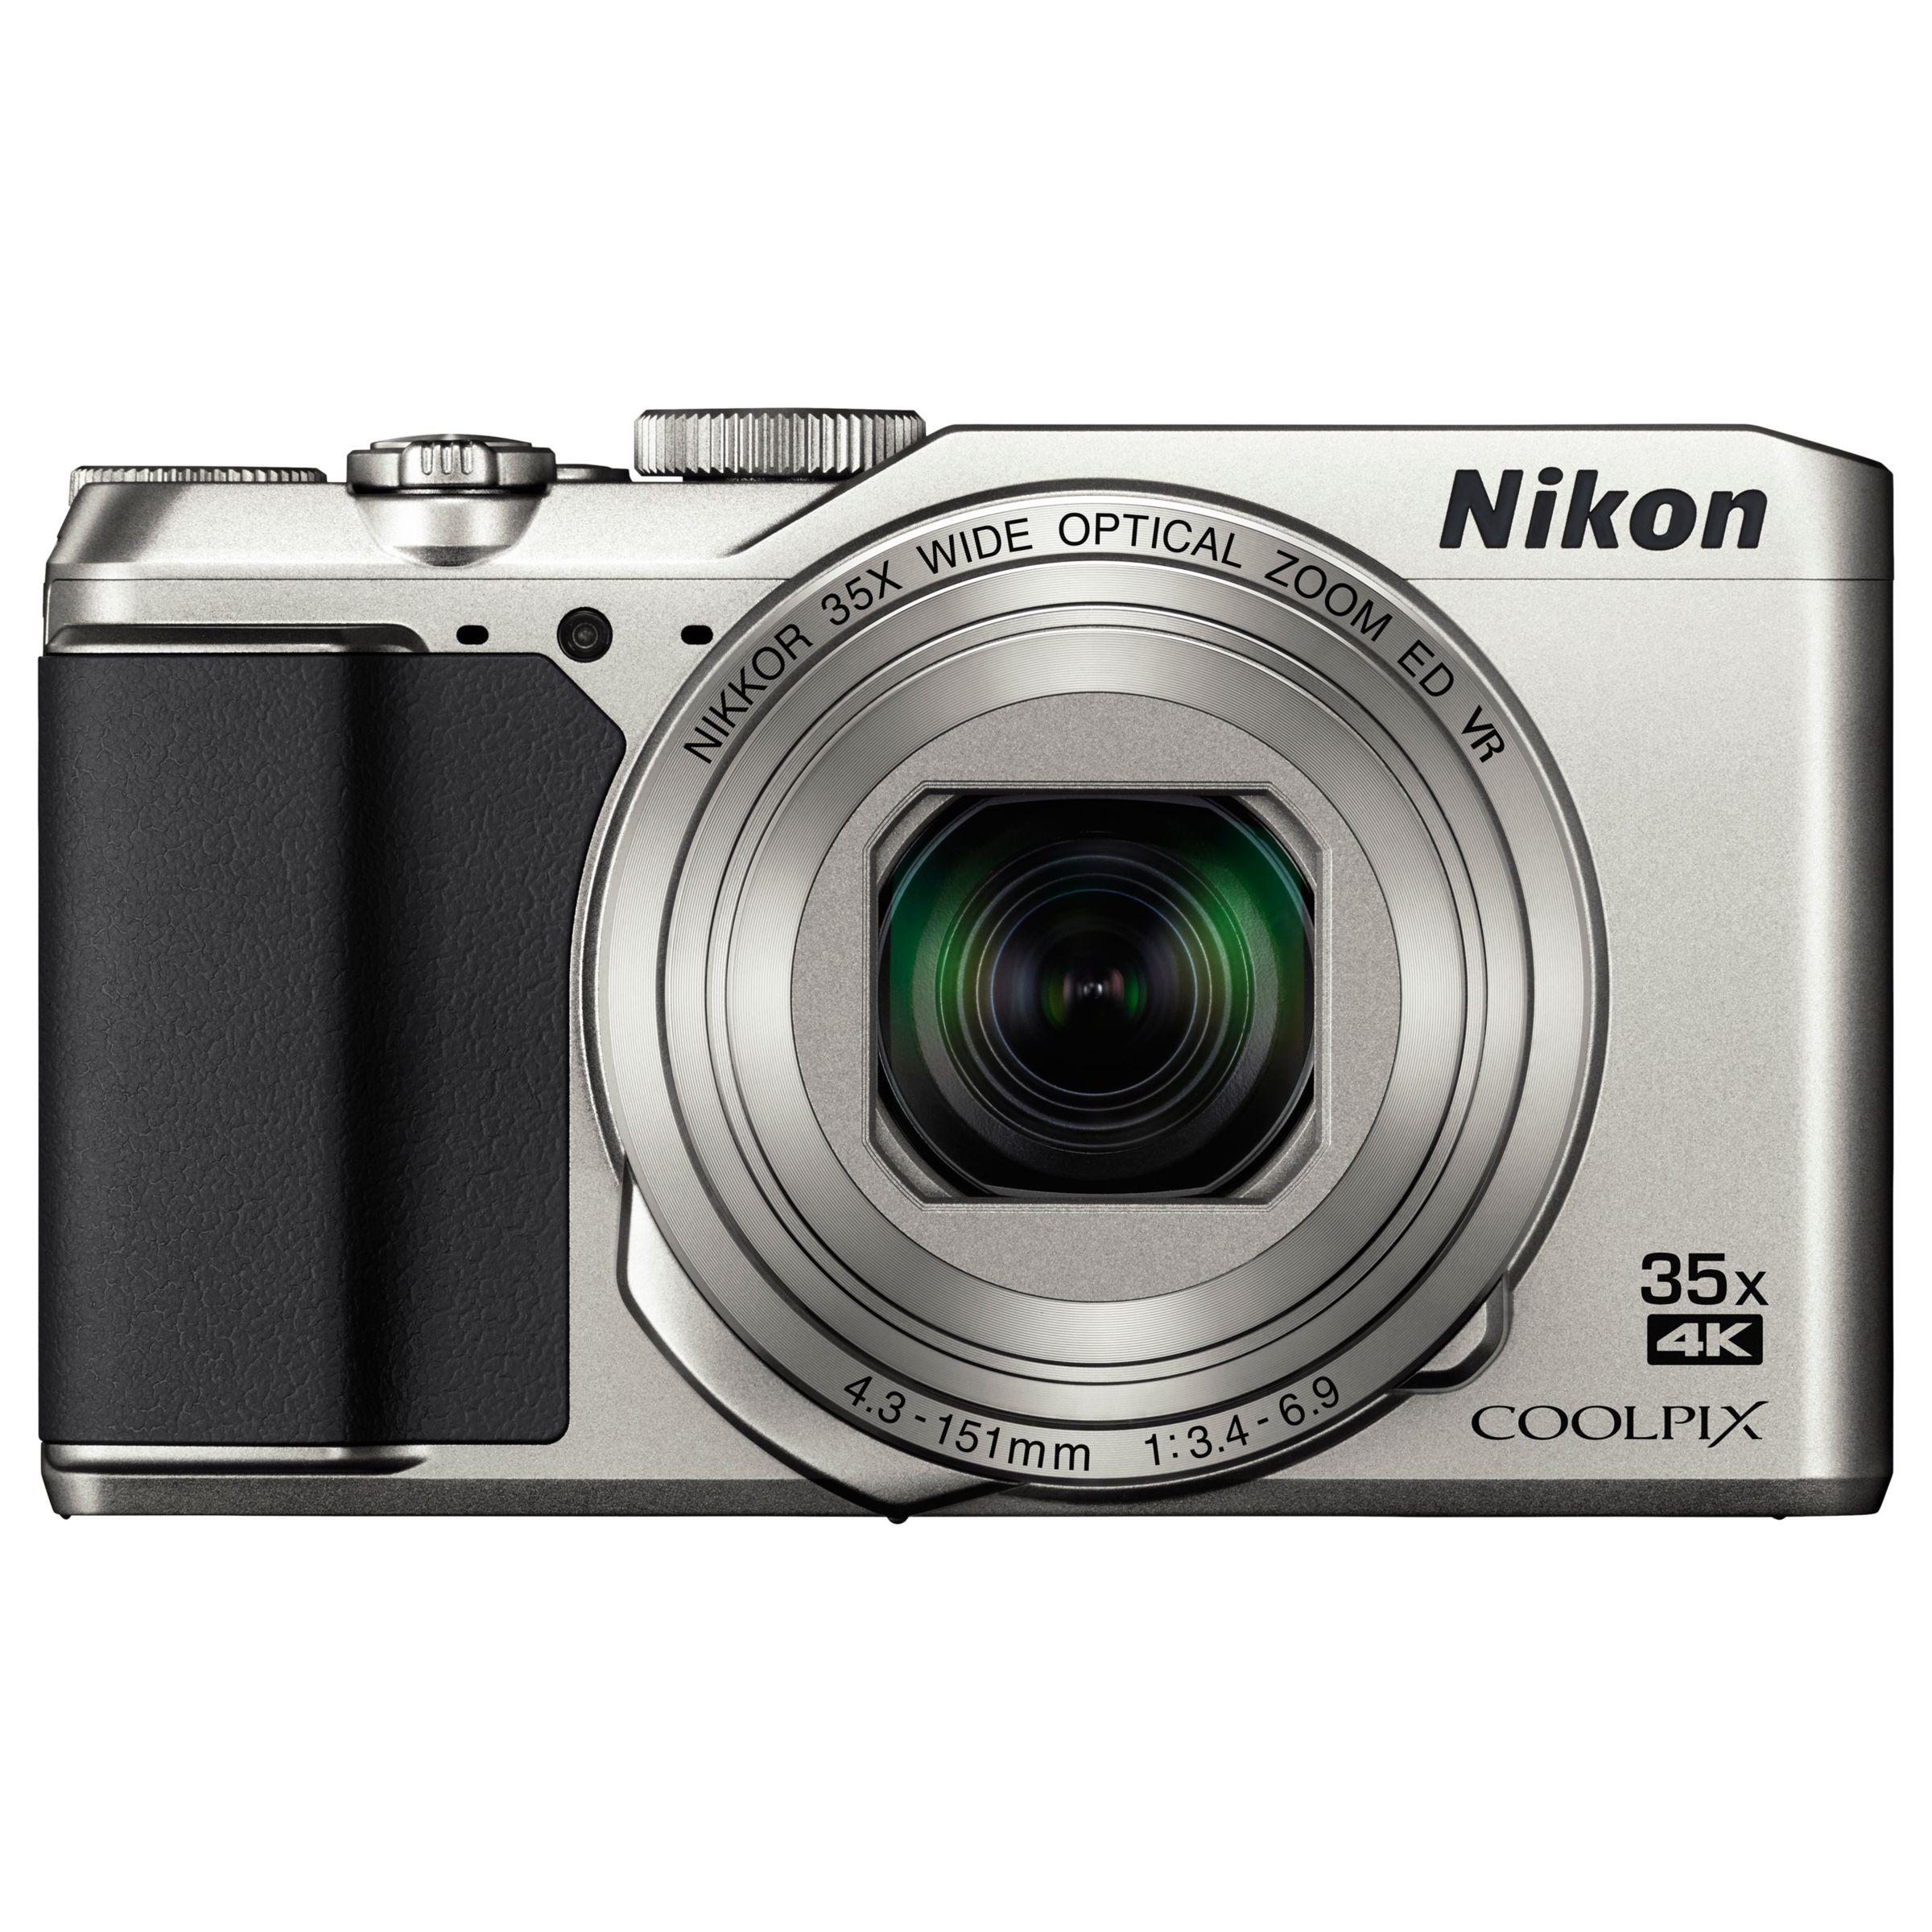 "Nikon Nikon COOLPIX A900 Digital Camera, 20.3MP, 4K Ultra HD, 35x Optical Zoom, Wi-Fi, Bluetooth & 3"" LCD Tiltable Screen, Silver"